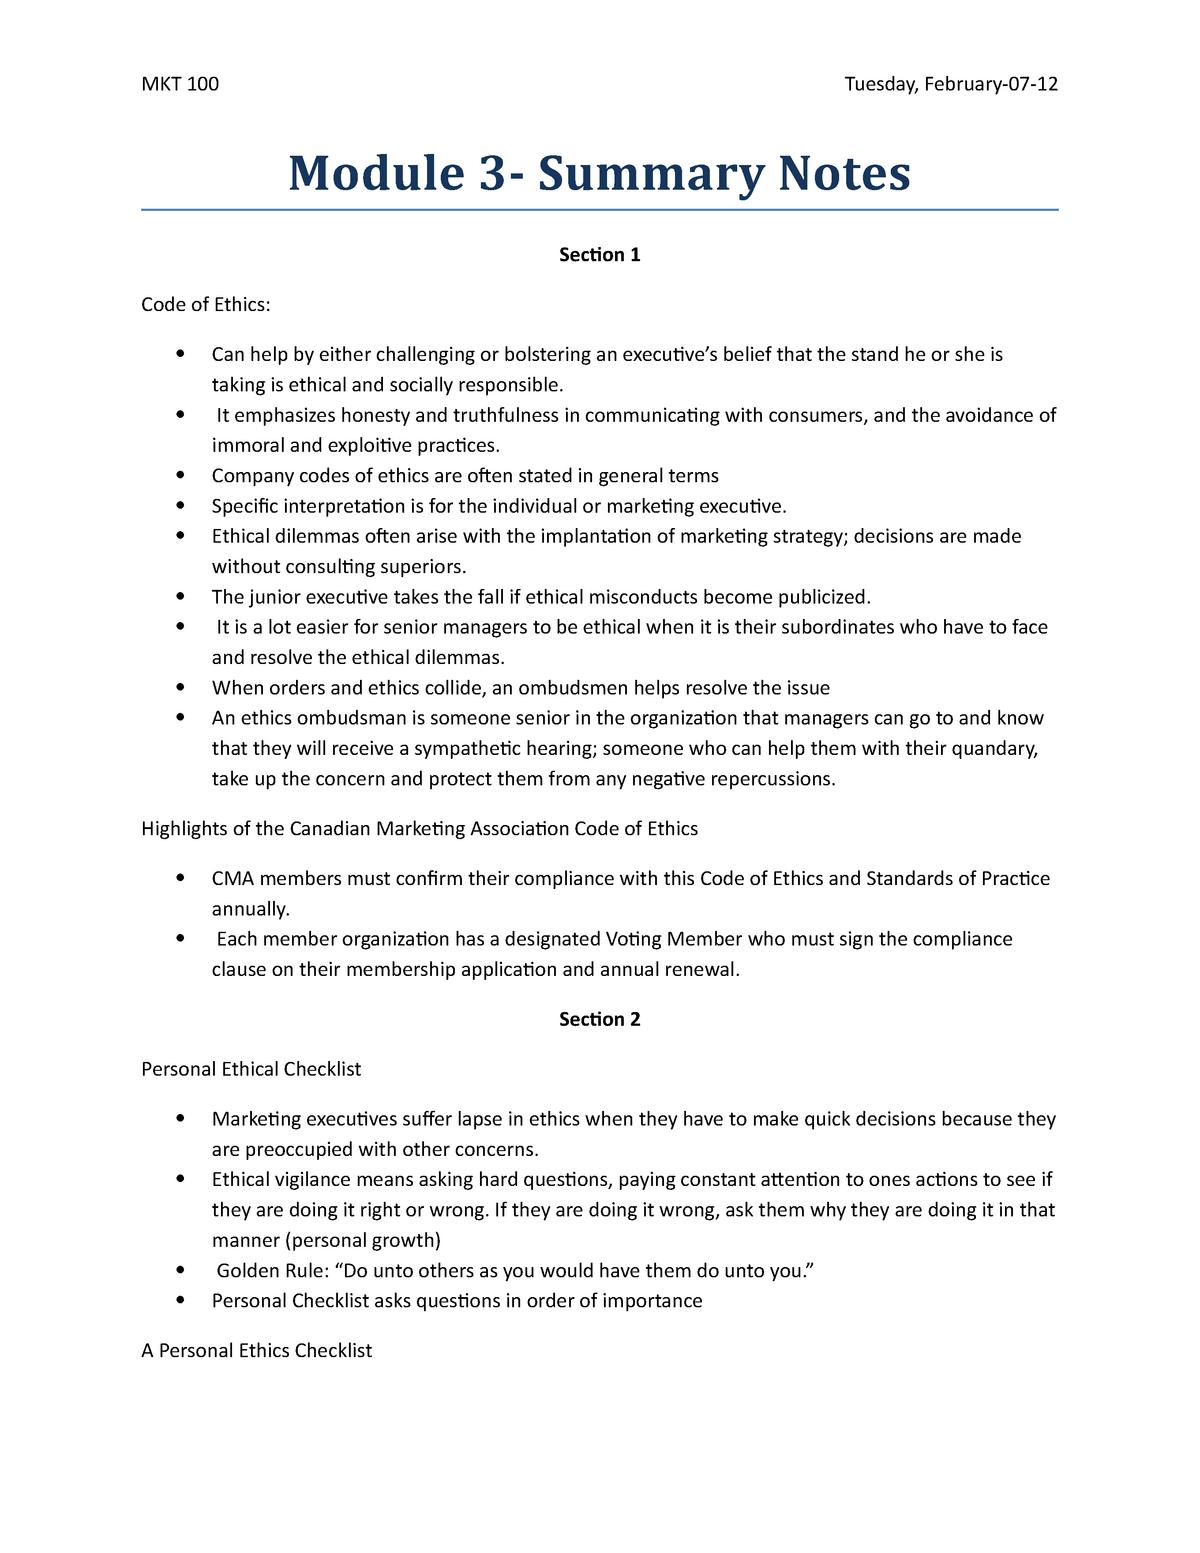 Summary - module 3 summary notes - CMKT100 - Ryerson - StuDocu